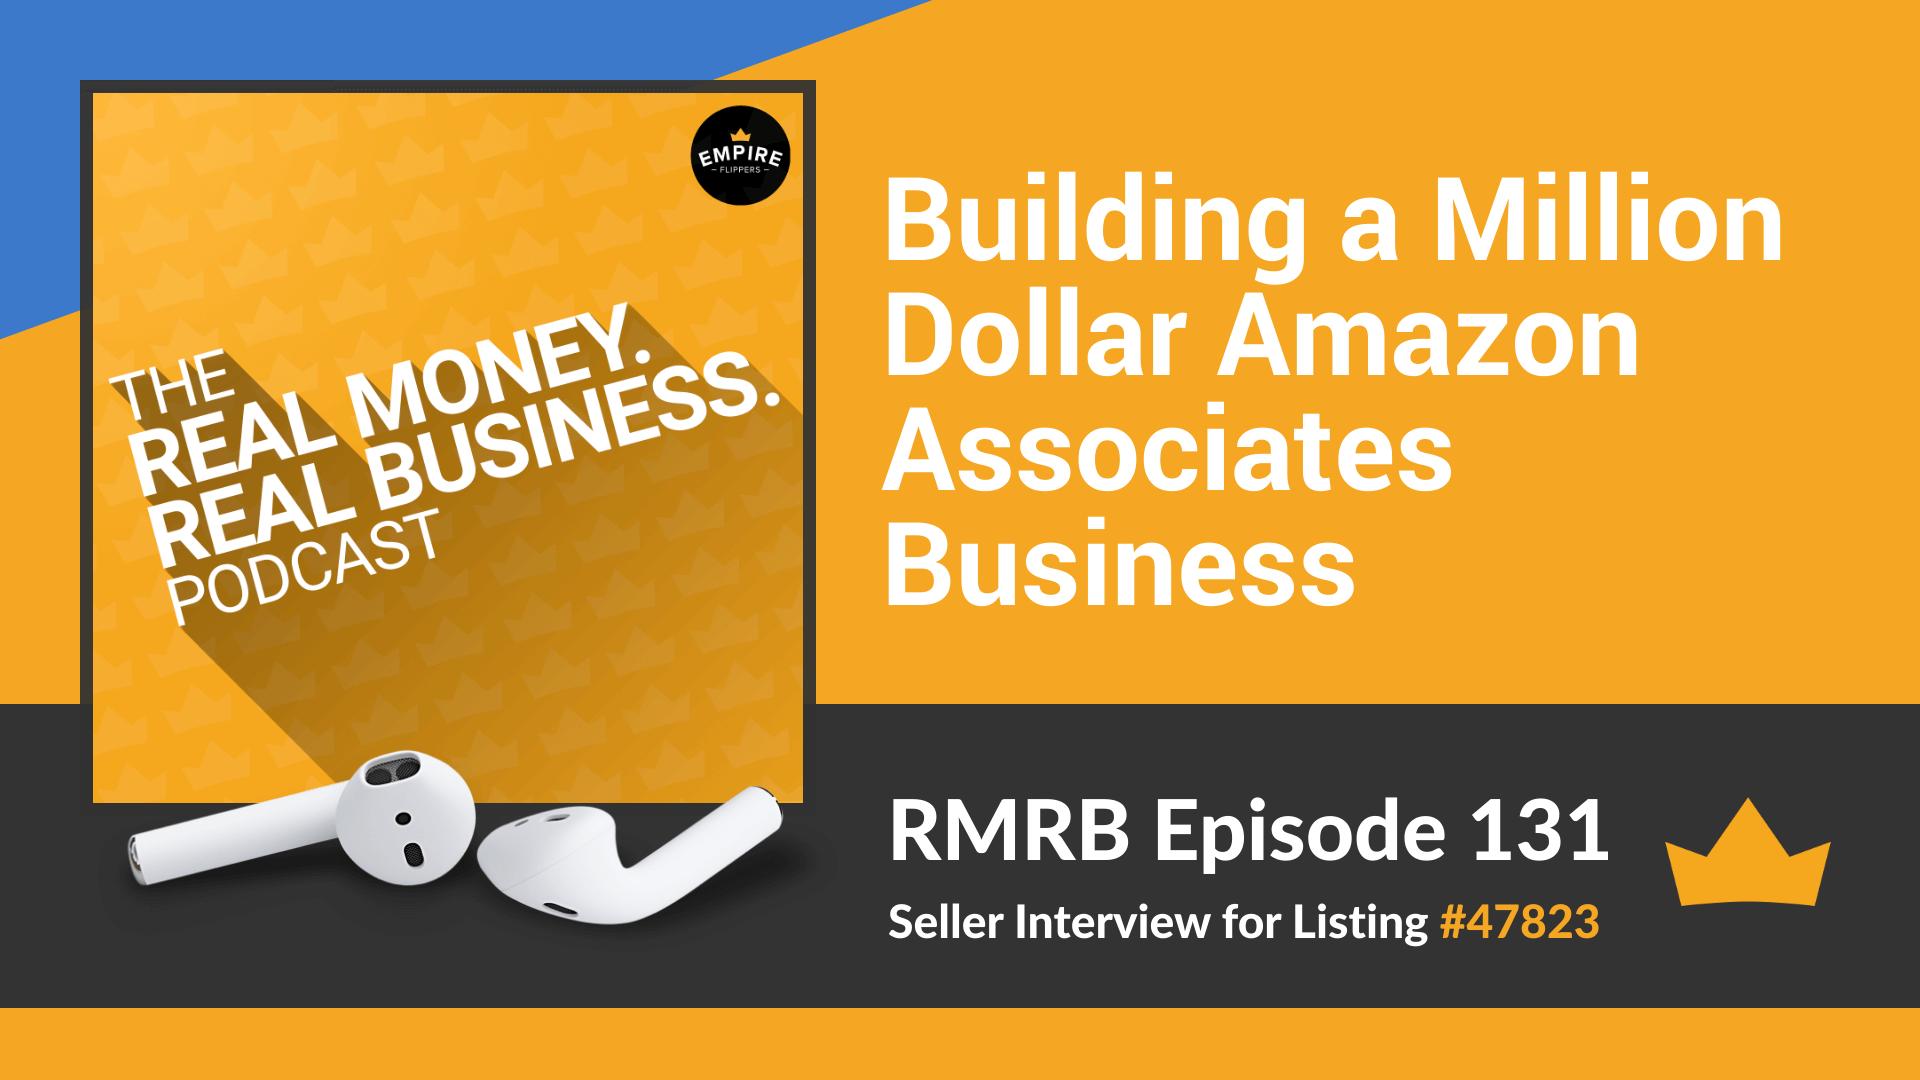 RMRB 131: Building a Million Dollar Amazon Associates Business